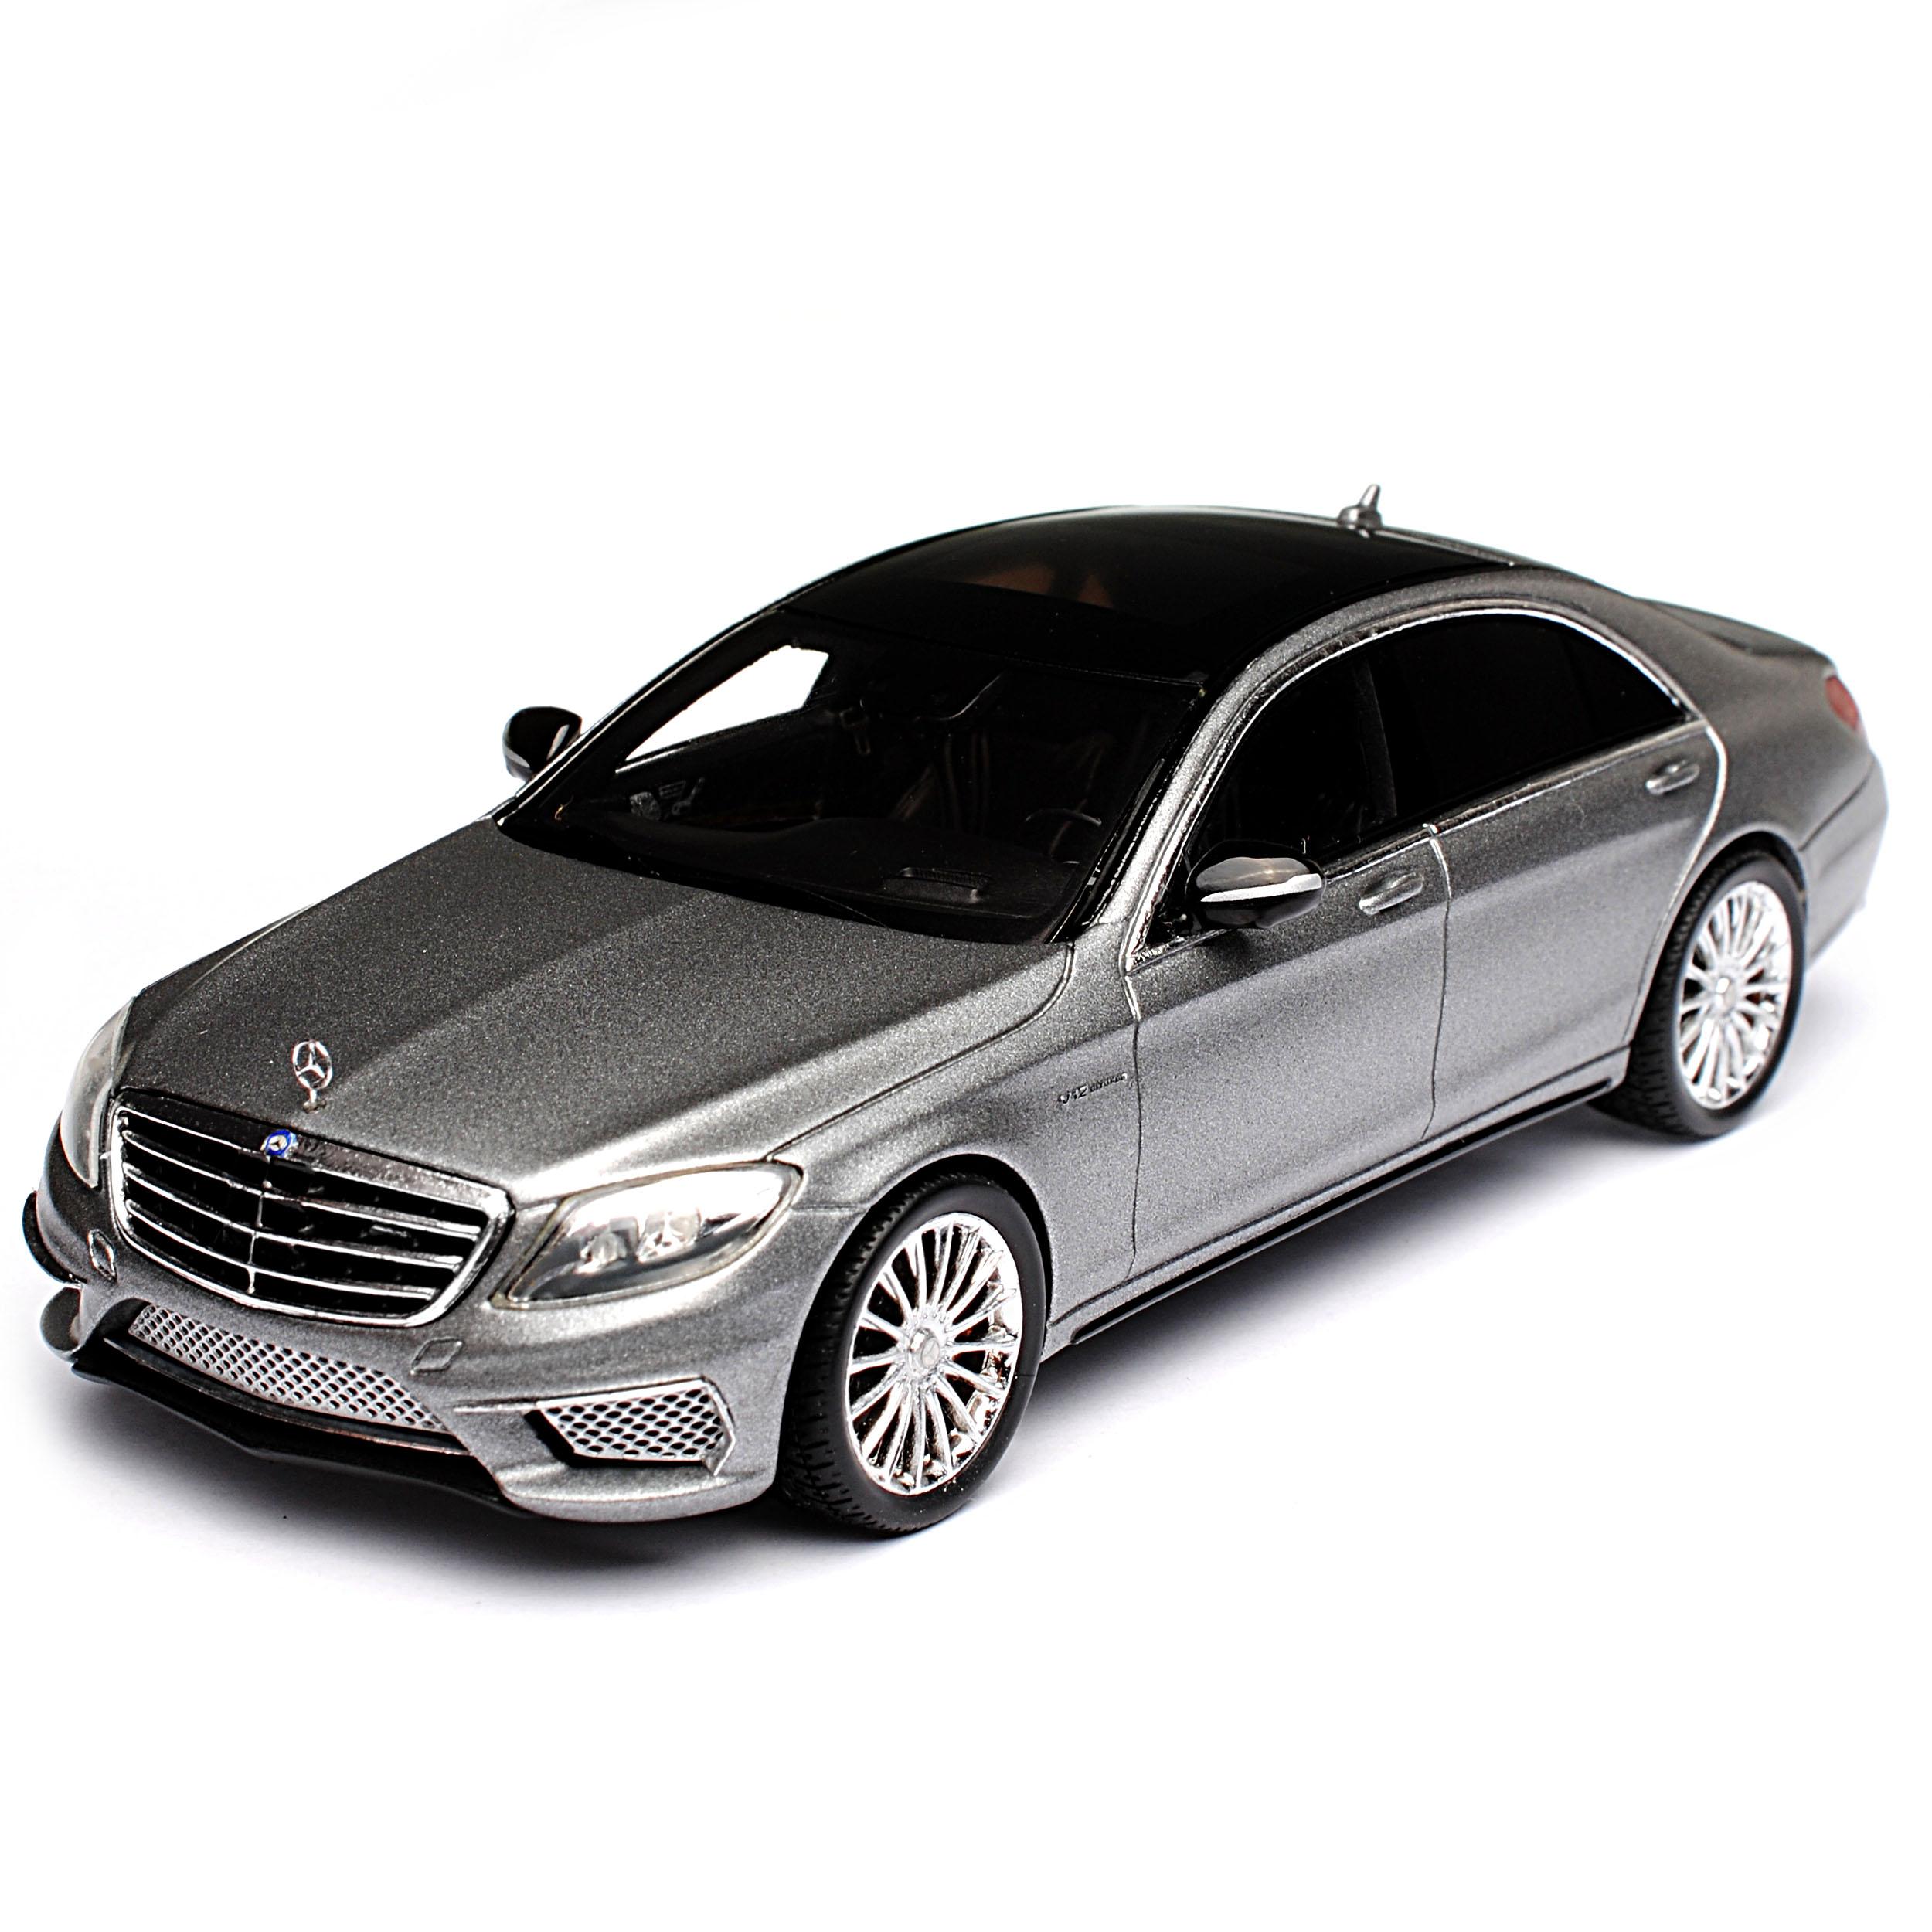 Mercedes-Benz S-Klasse W222 S65 AMG Silber Grau Ab 2013 1//43 Spark Modell Auto..